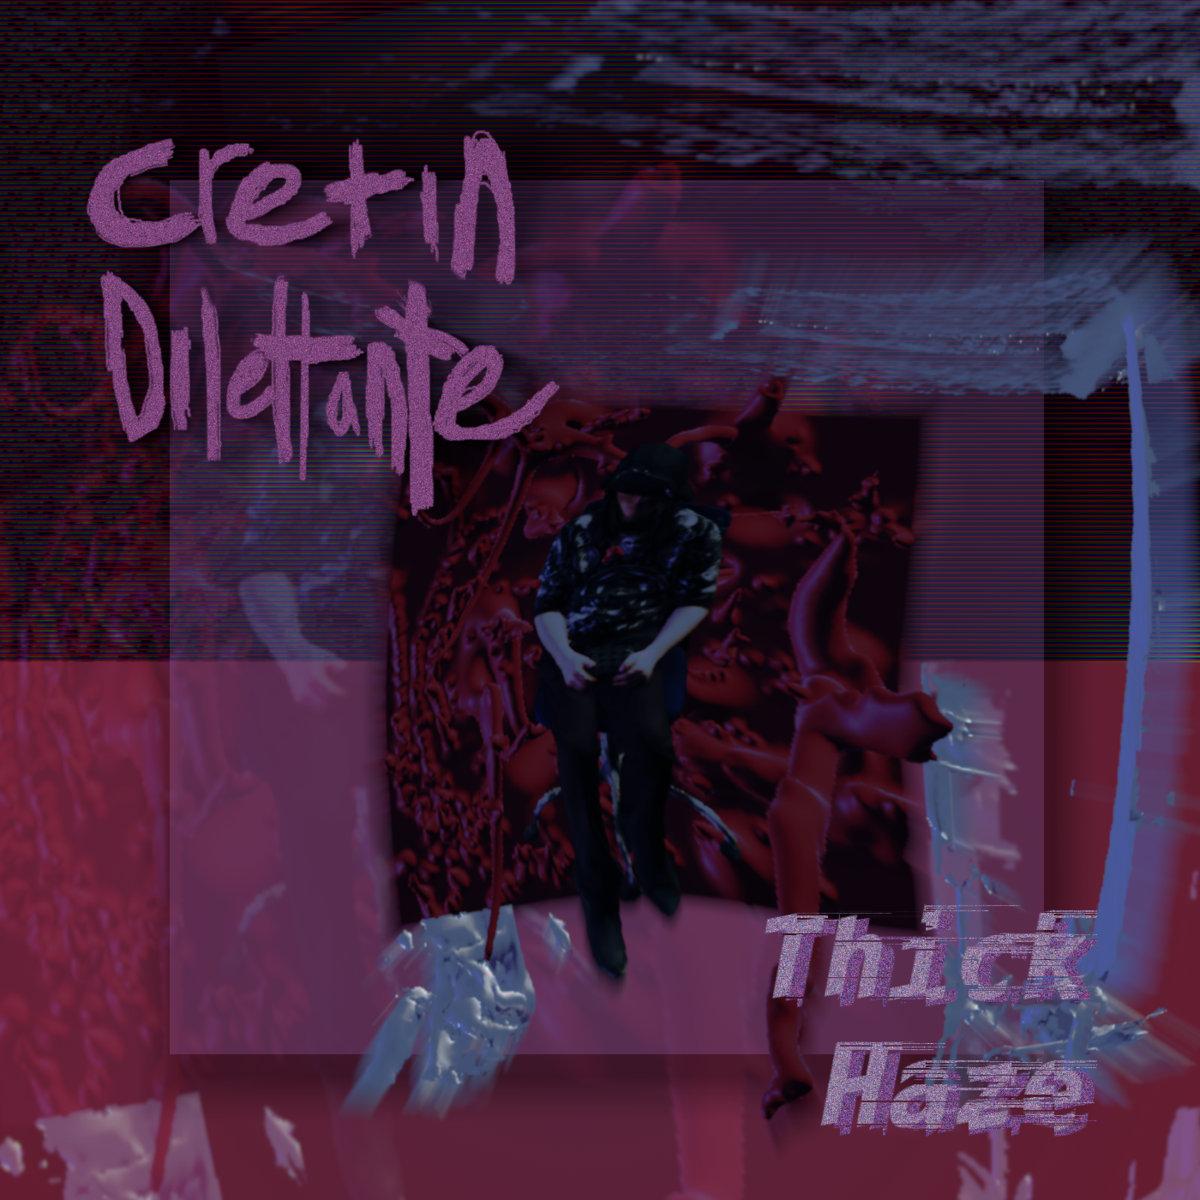 Observer: Cretin Dilettante & Dead Husband